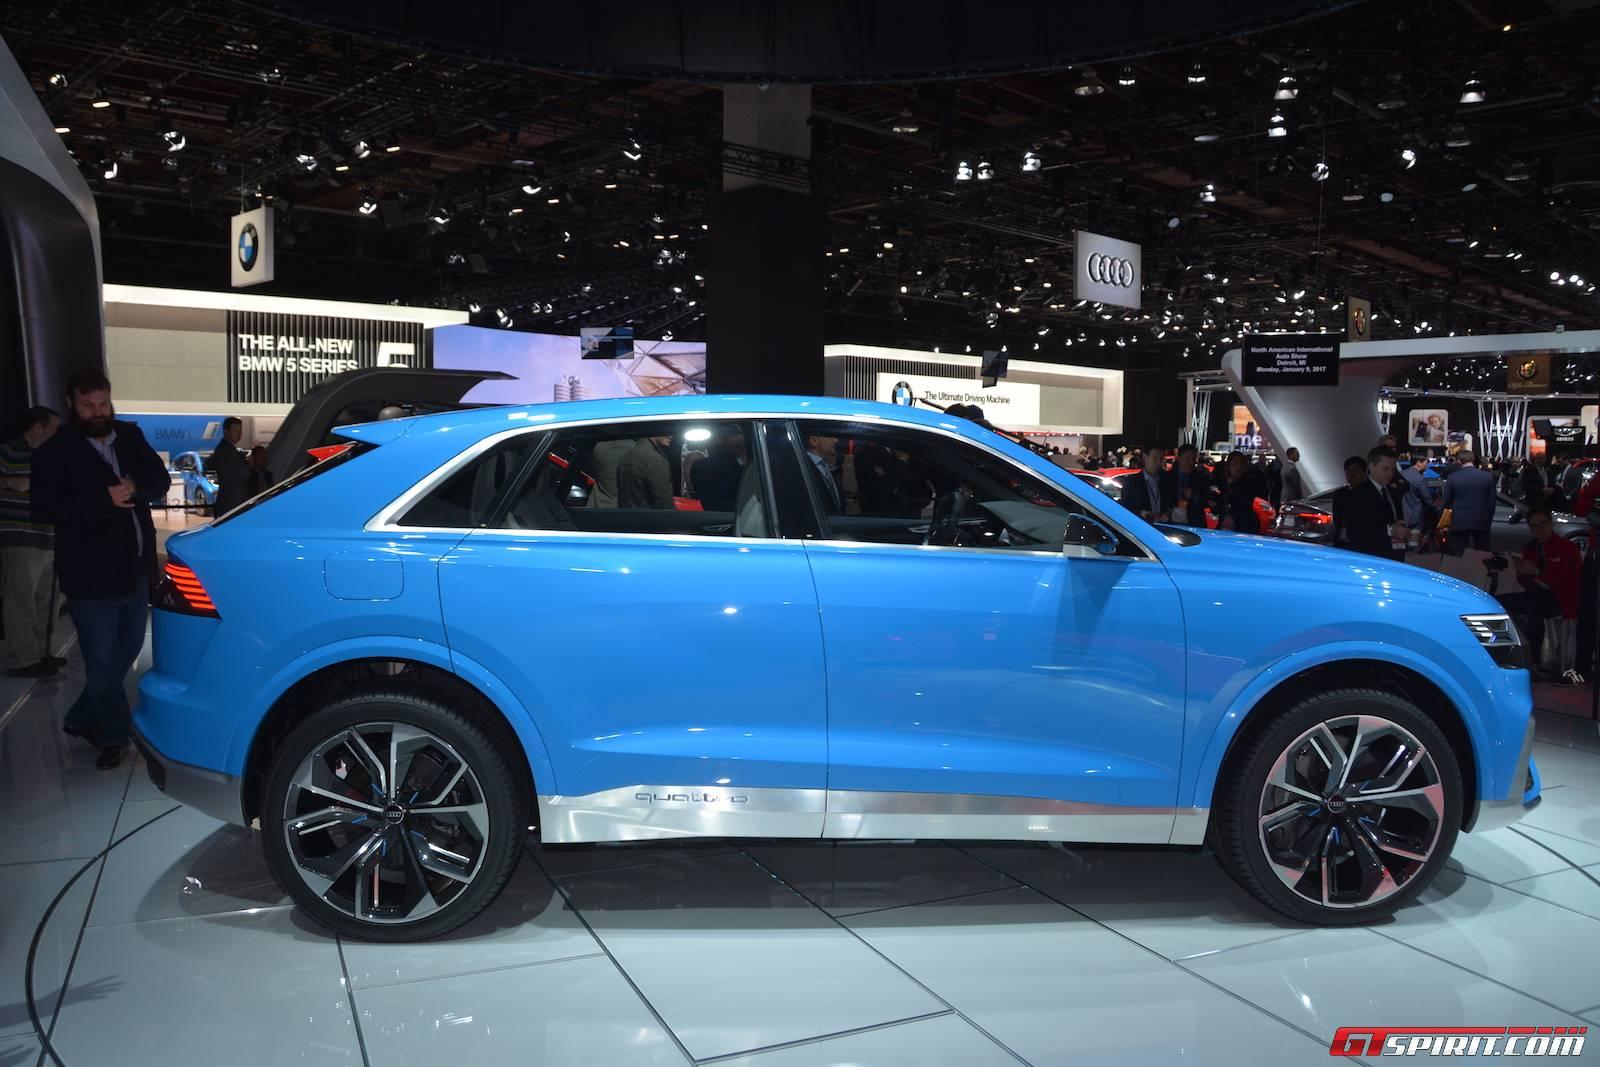 600hp Audi Rs Q8 Concept To Debut At Geneva 2017 Gtspirit